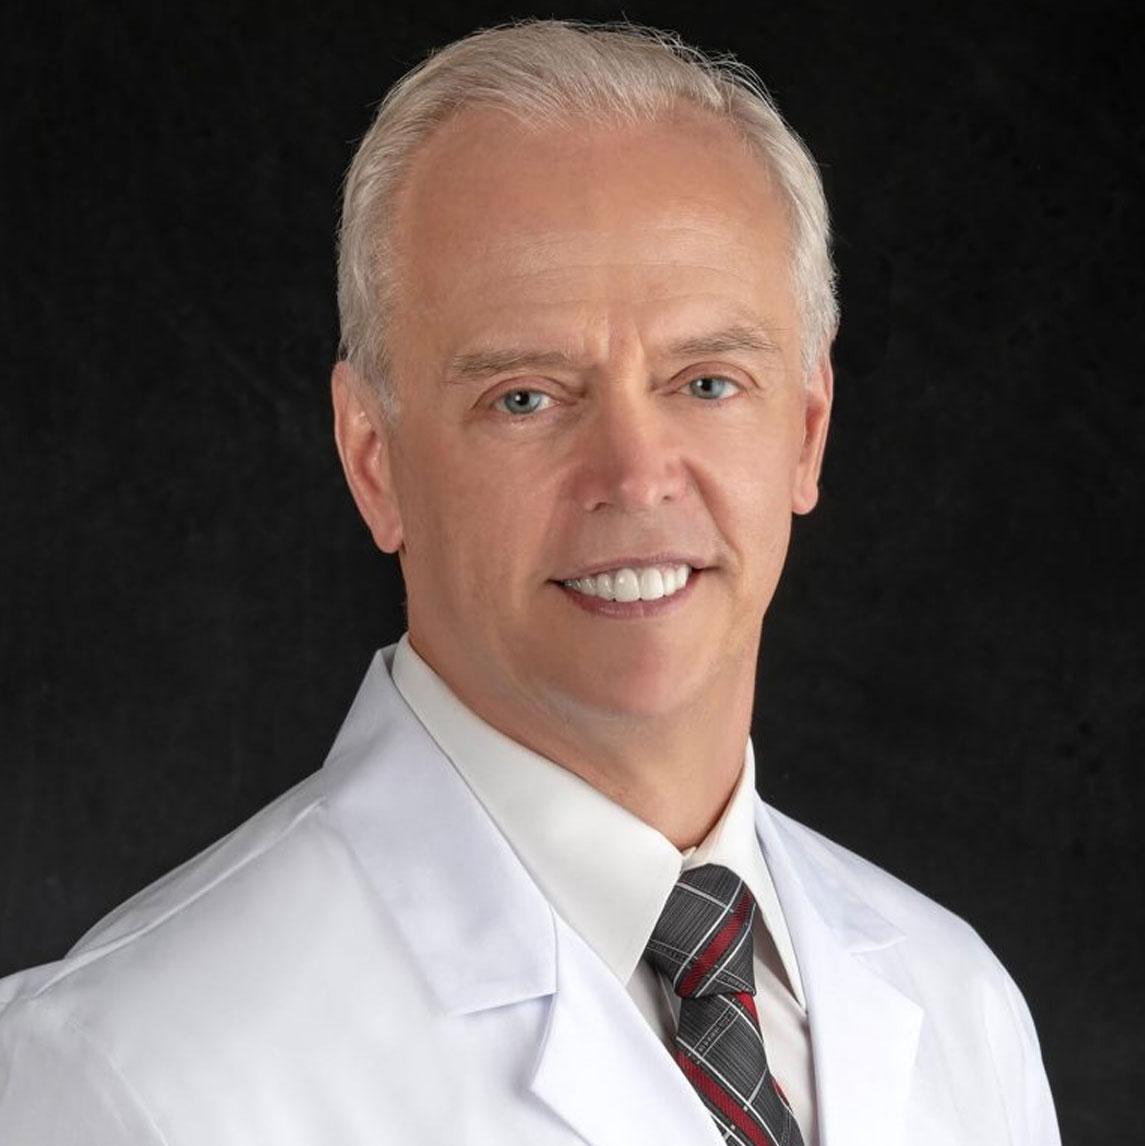 Dr Richard Mauer MD